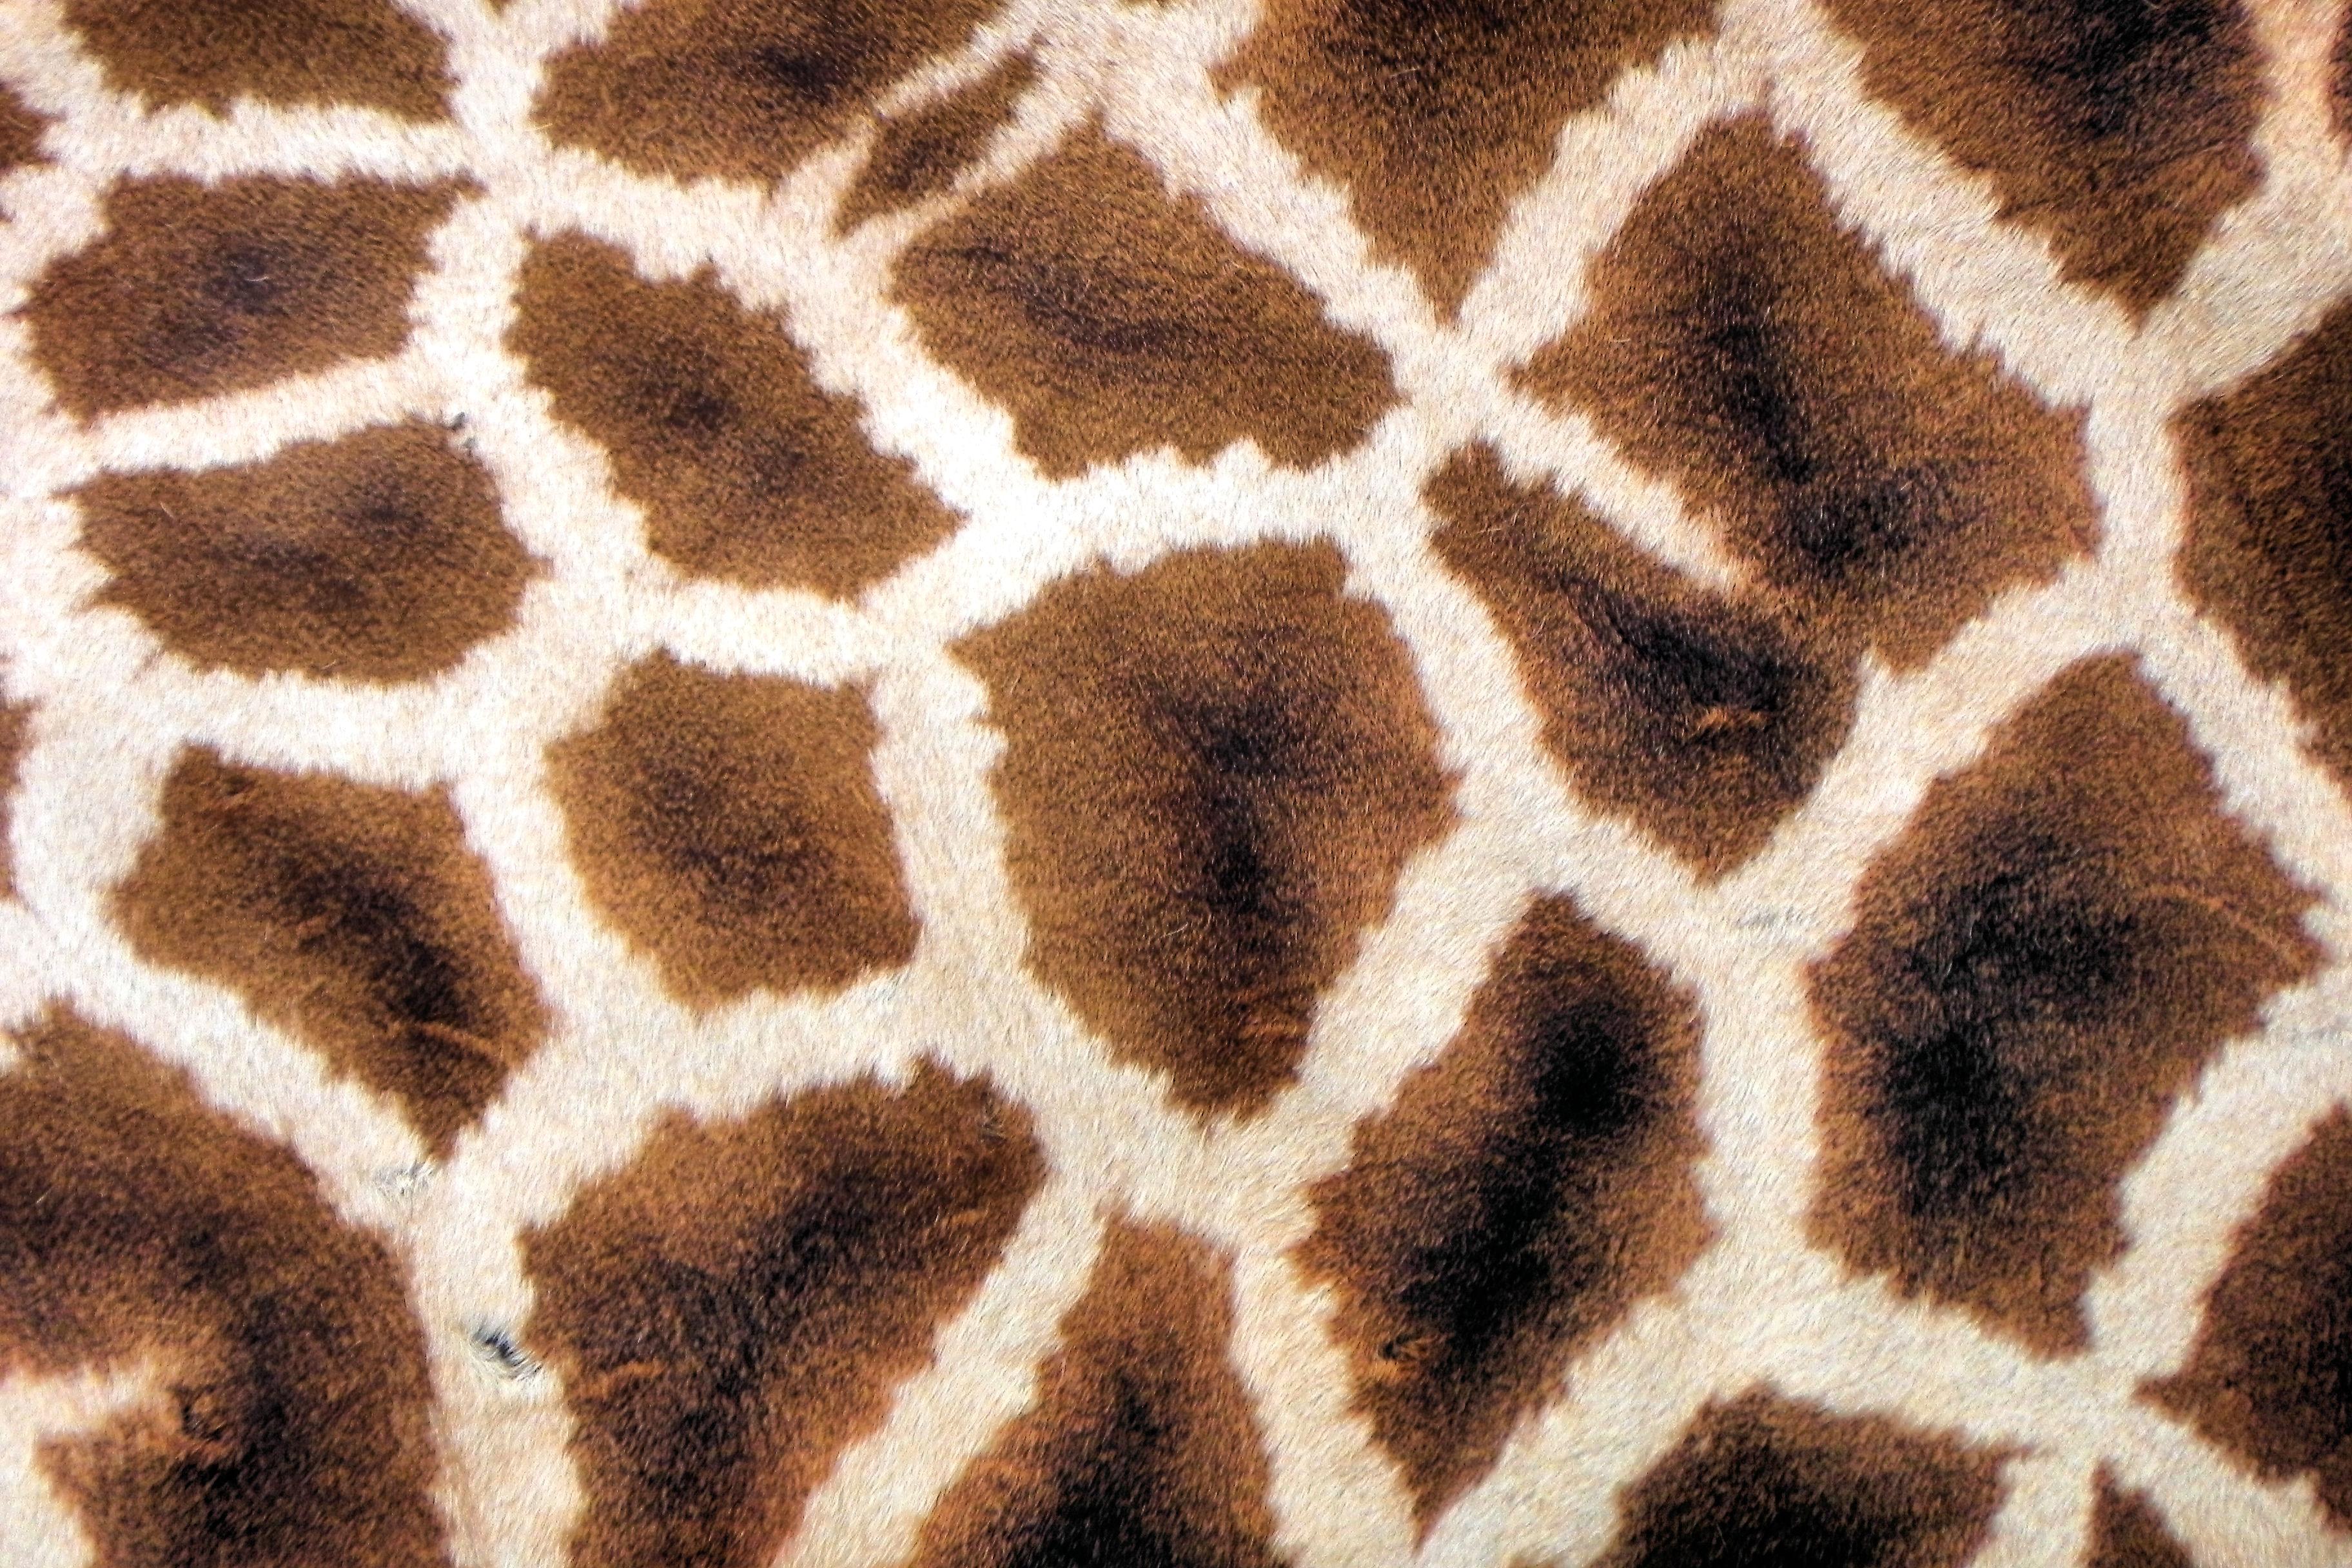 animal skin patterns giraffe - photo #19